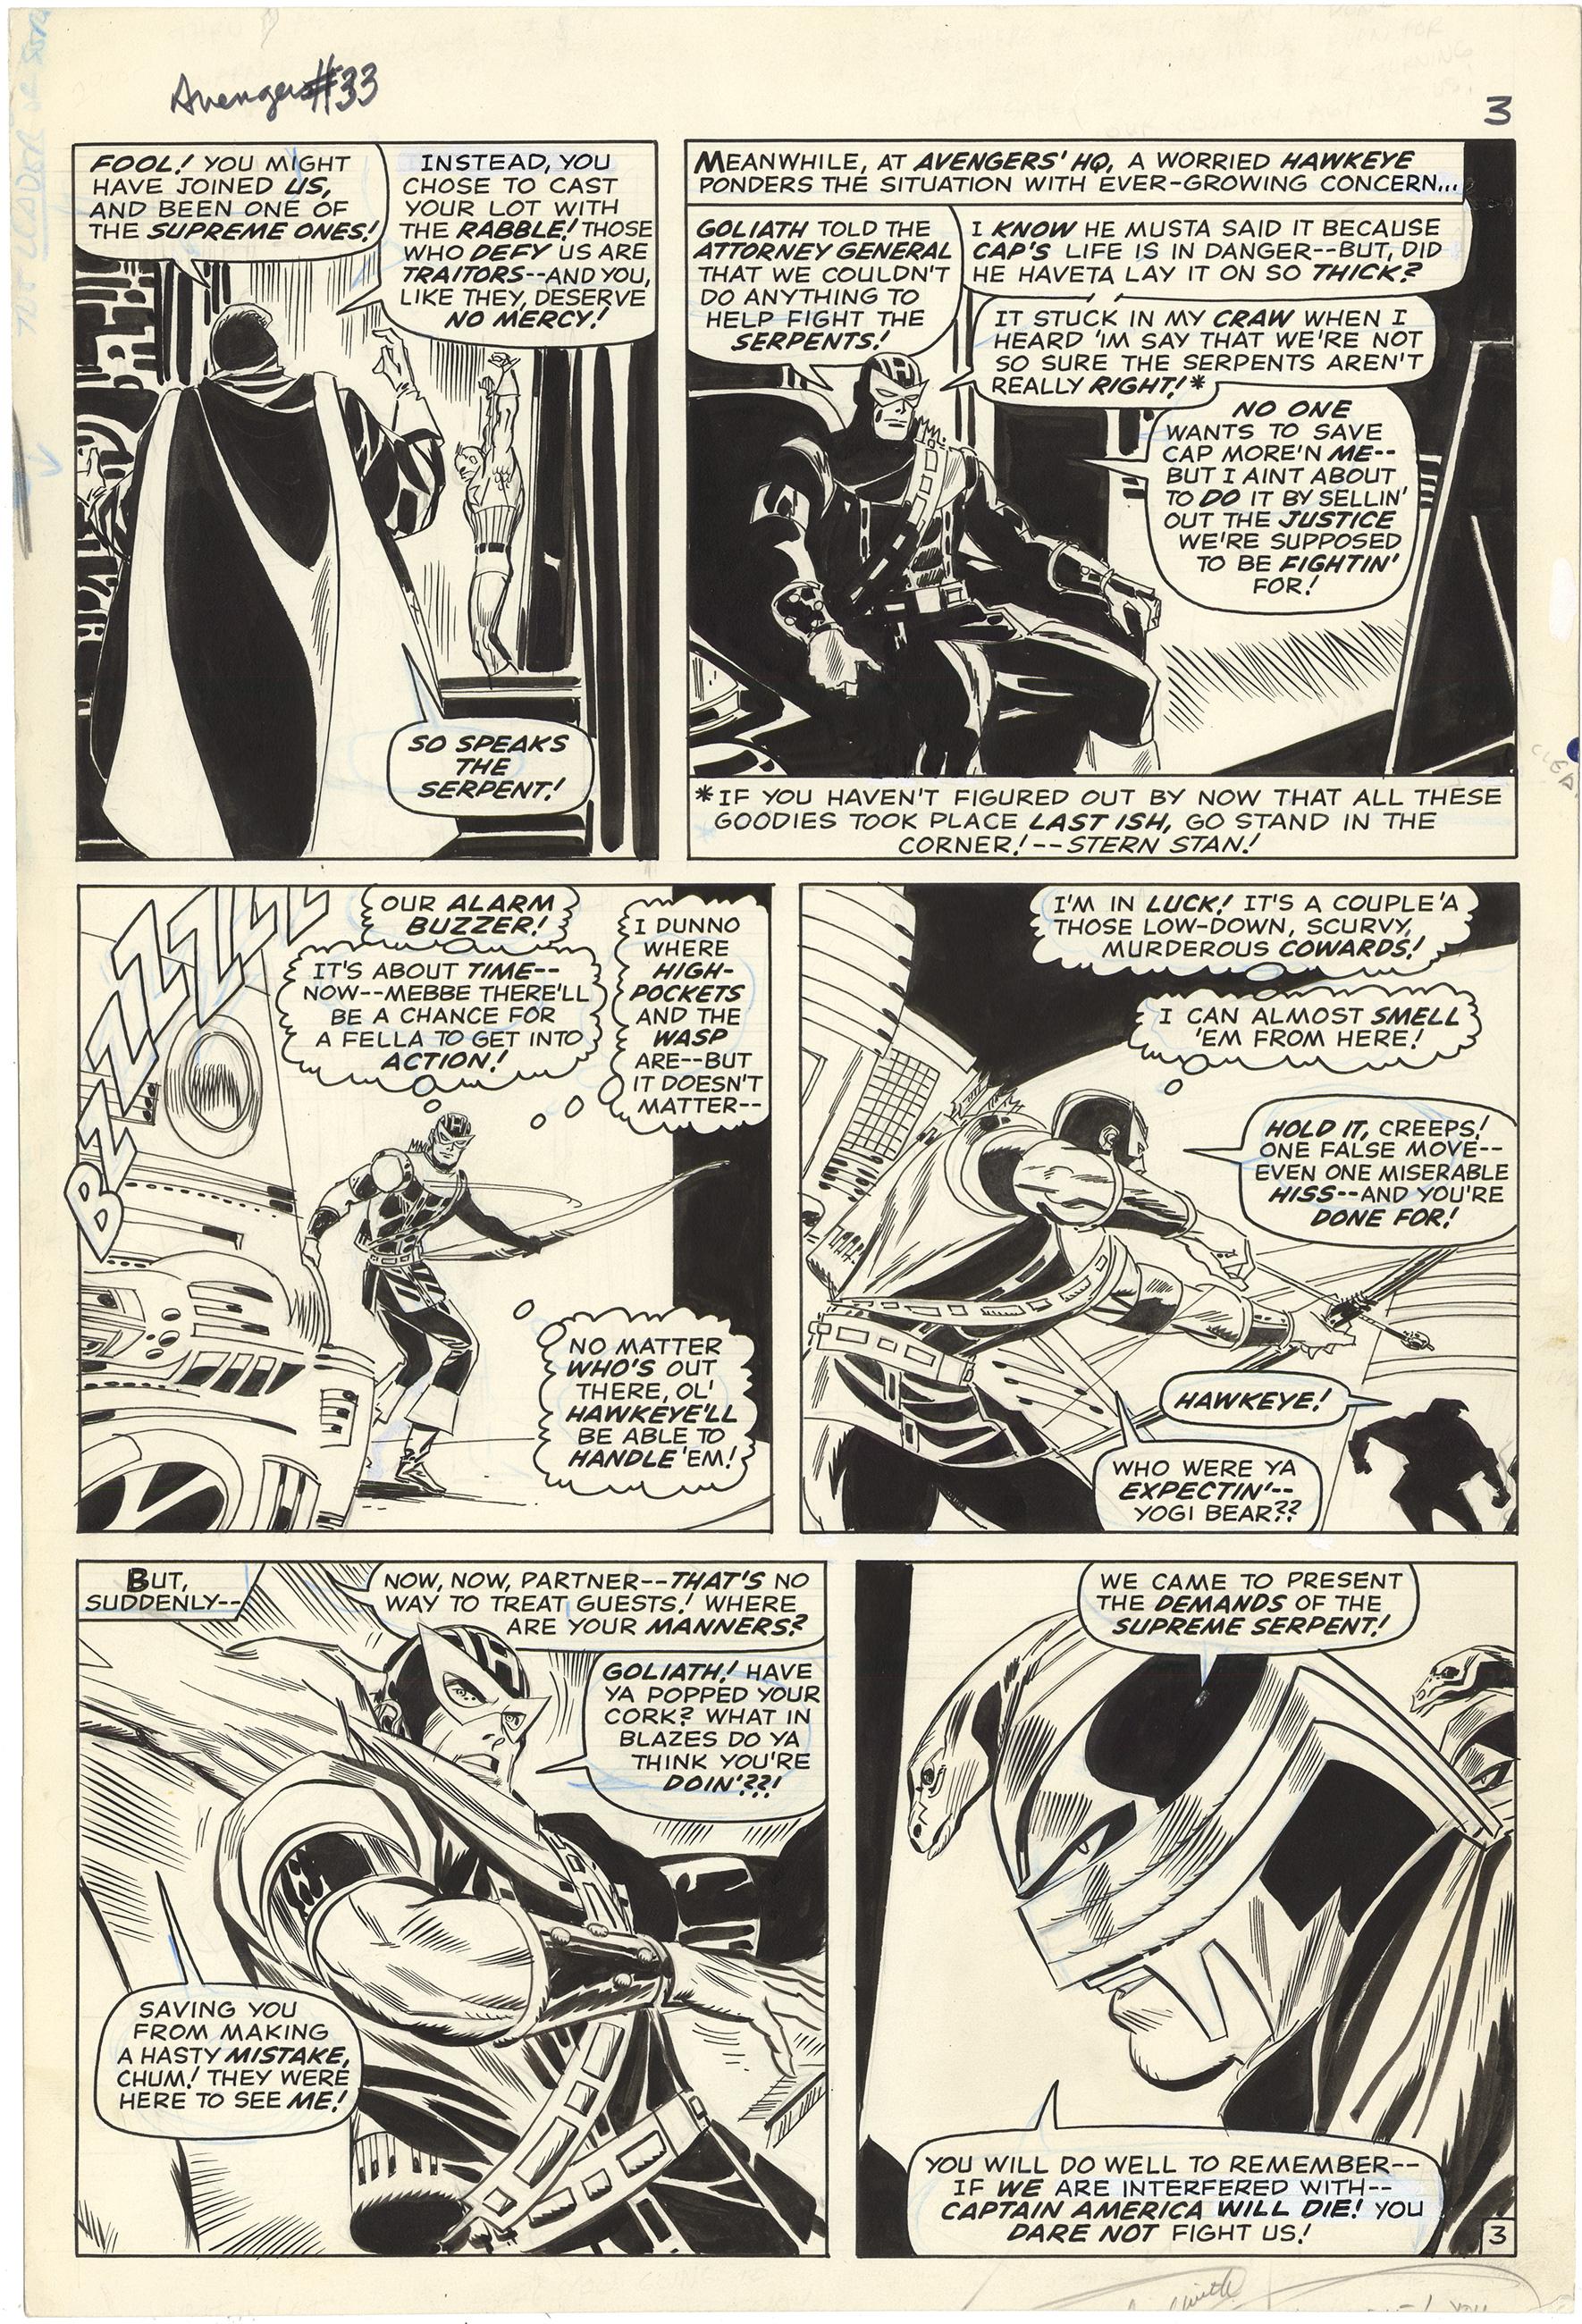 Avengers #33 p3 (Large Art)